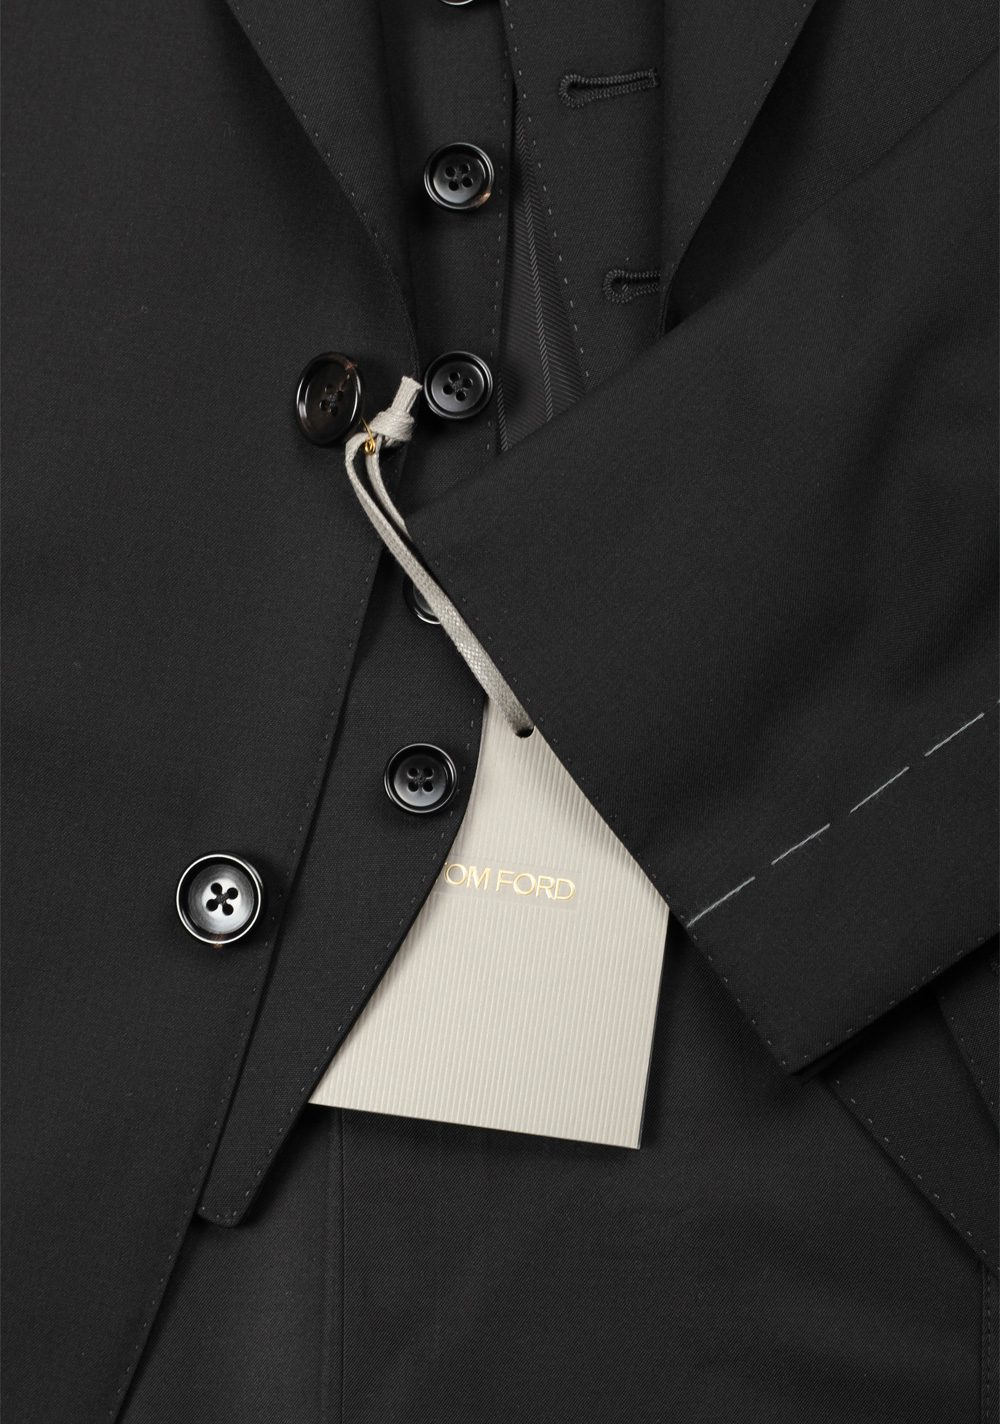 TOM FORD Windsor Signature Solid Black 3 Piece Suit | Costume Limité